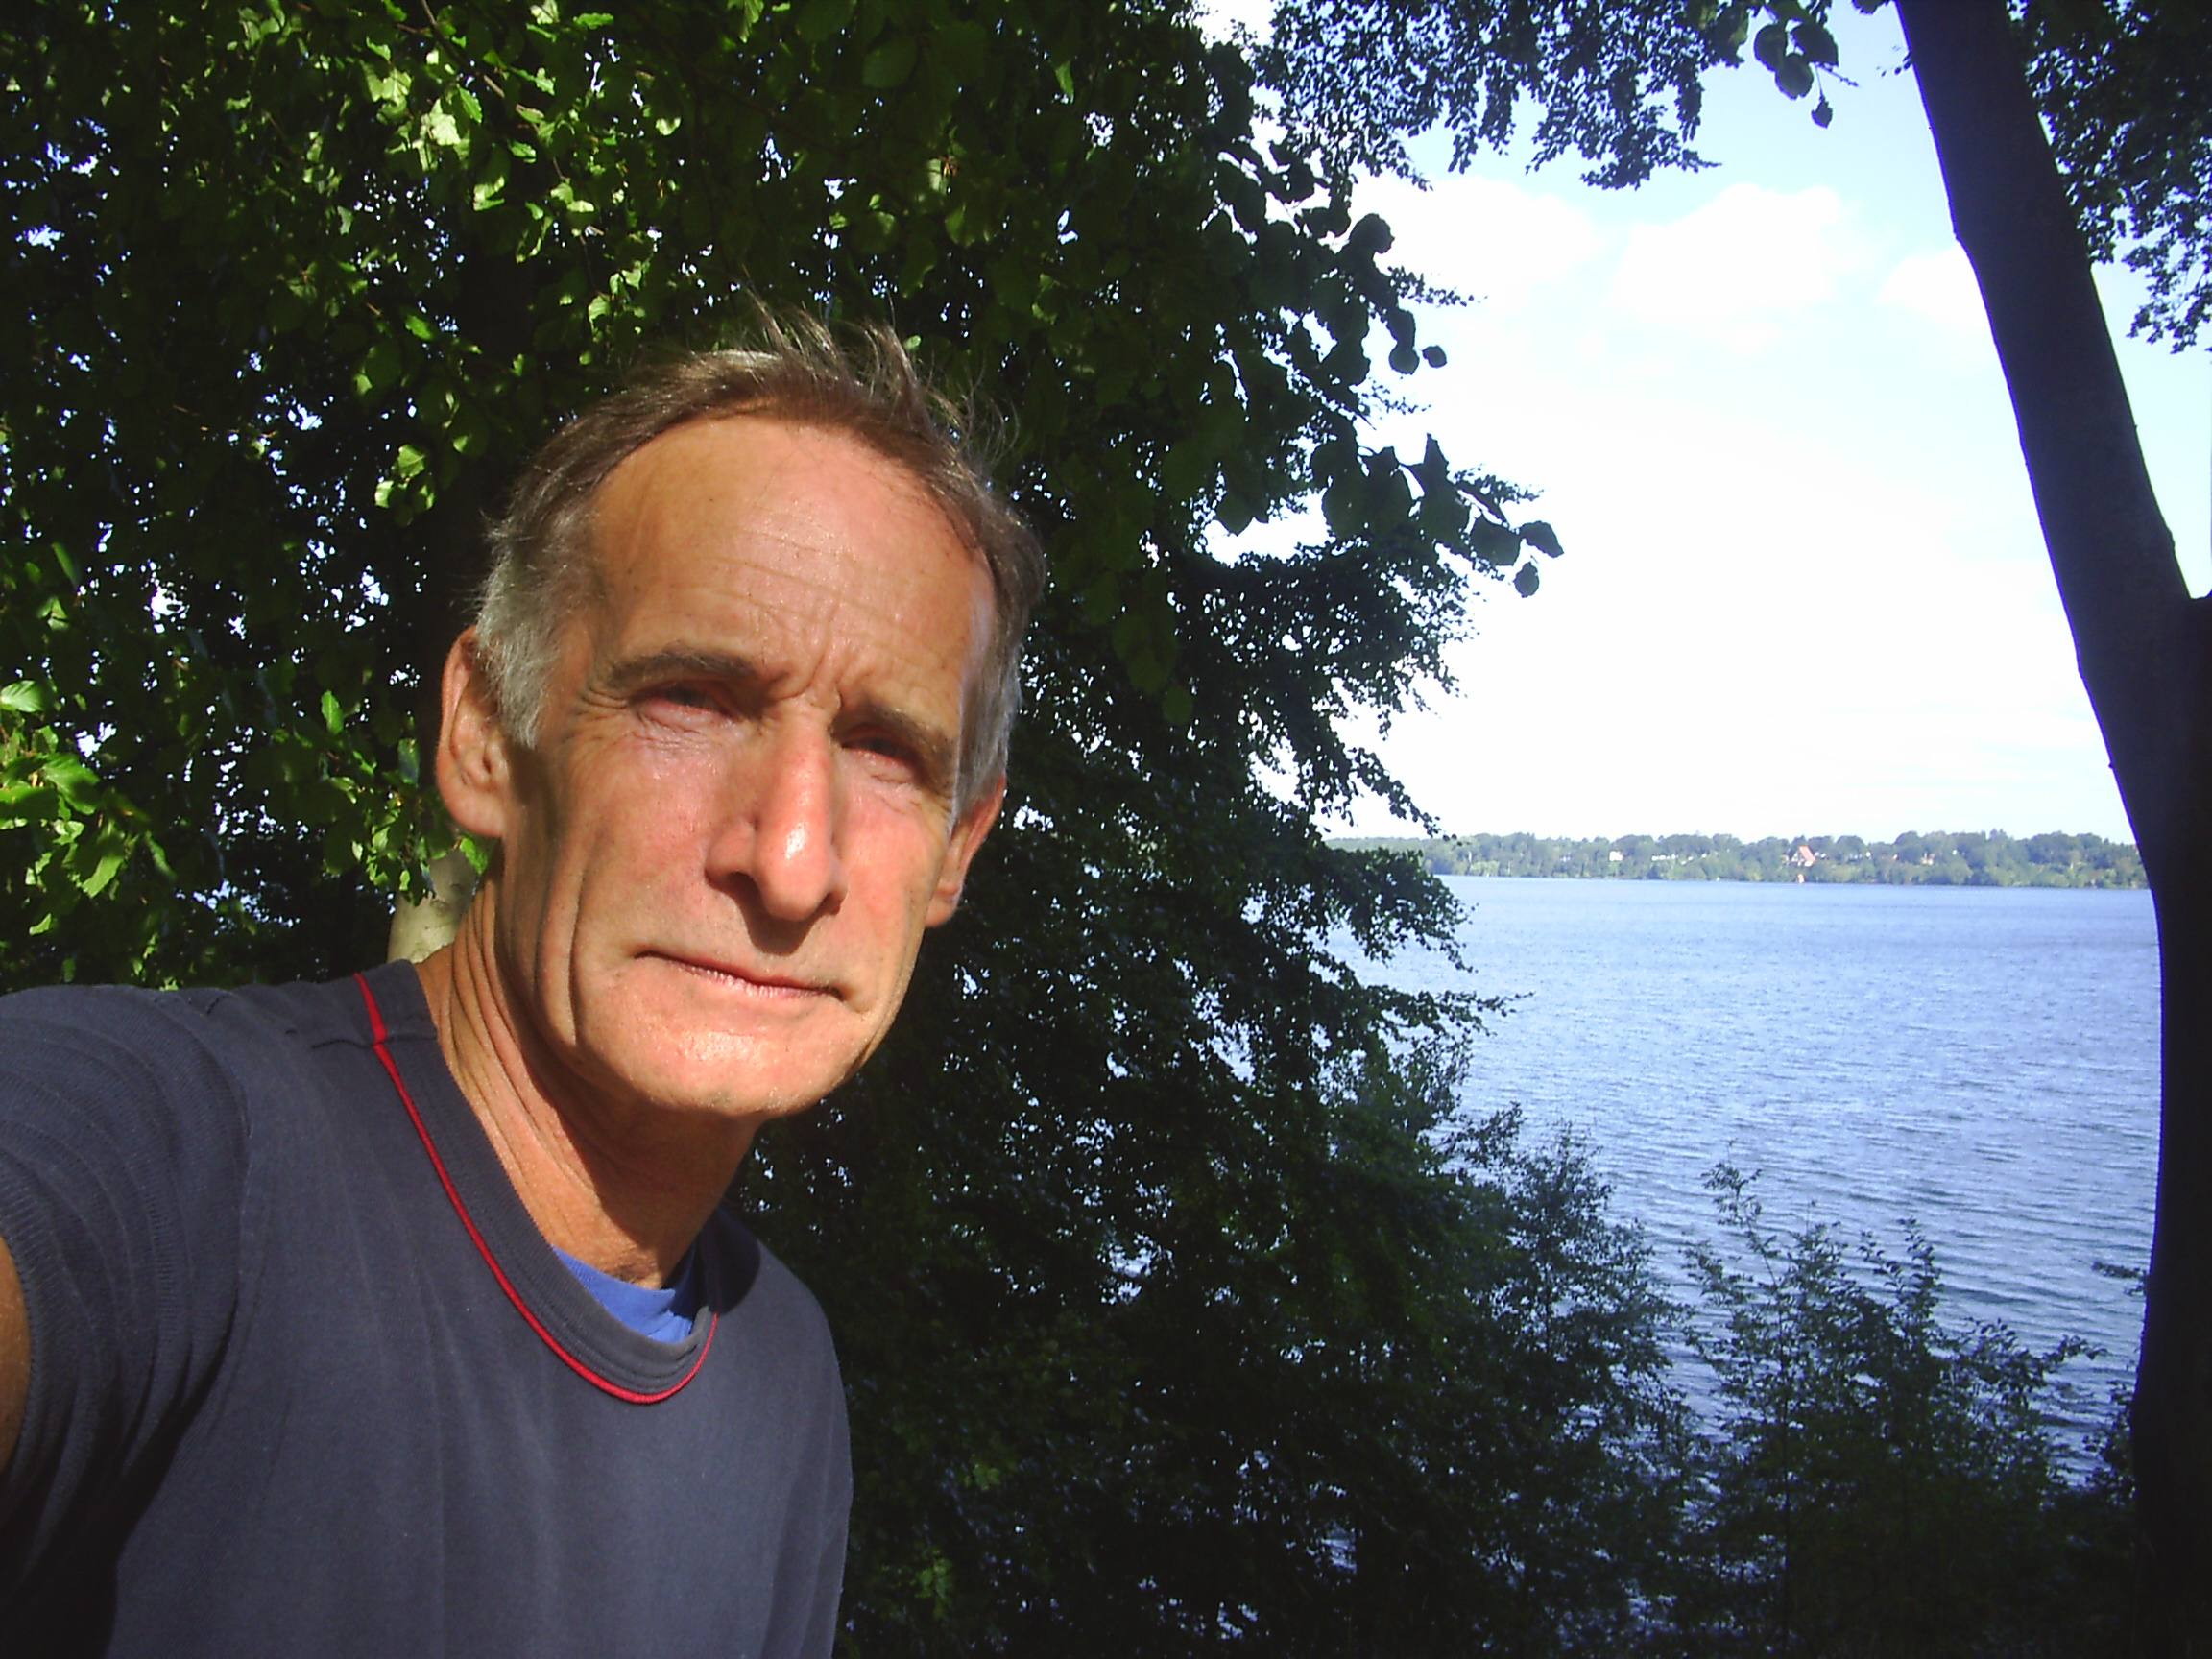 Erik K Abrahamsen, born 1945 in Skagen, Denmark. Photo september 2008 by Furesøen, Nordsjælland